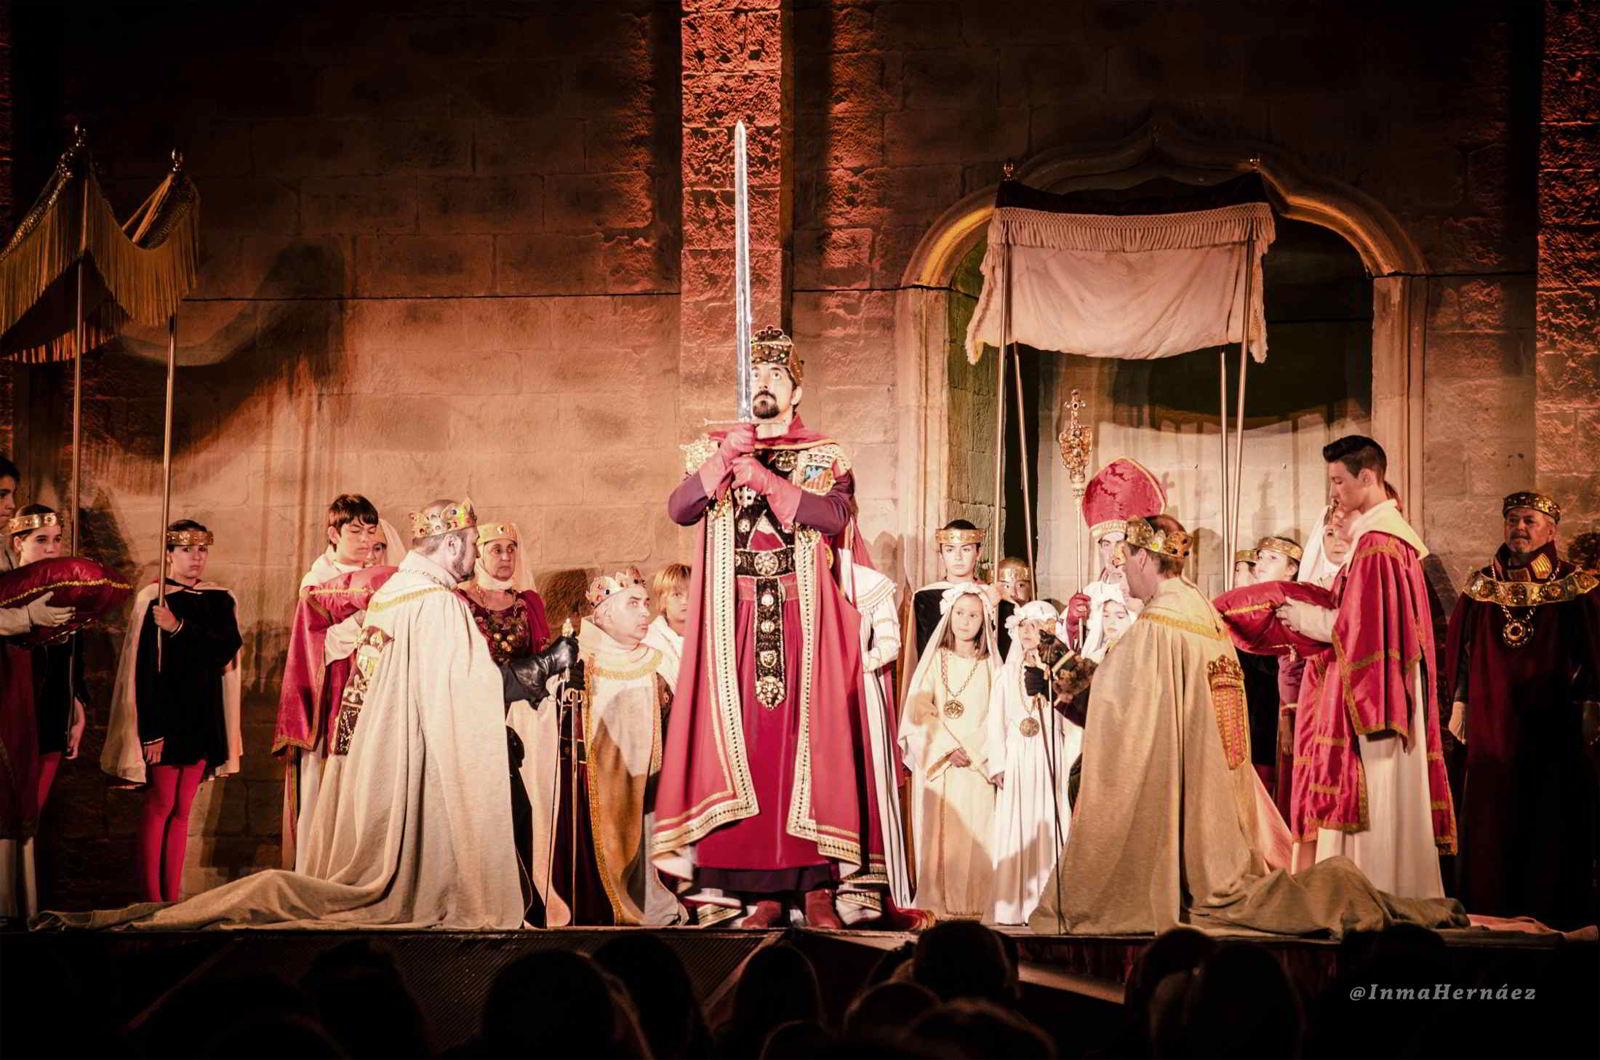 Reino de Nájera, Cuna de Reyes